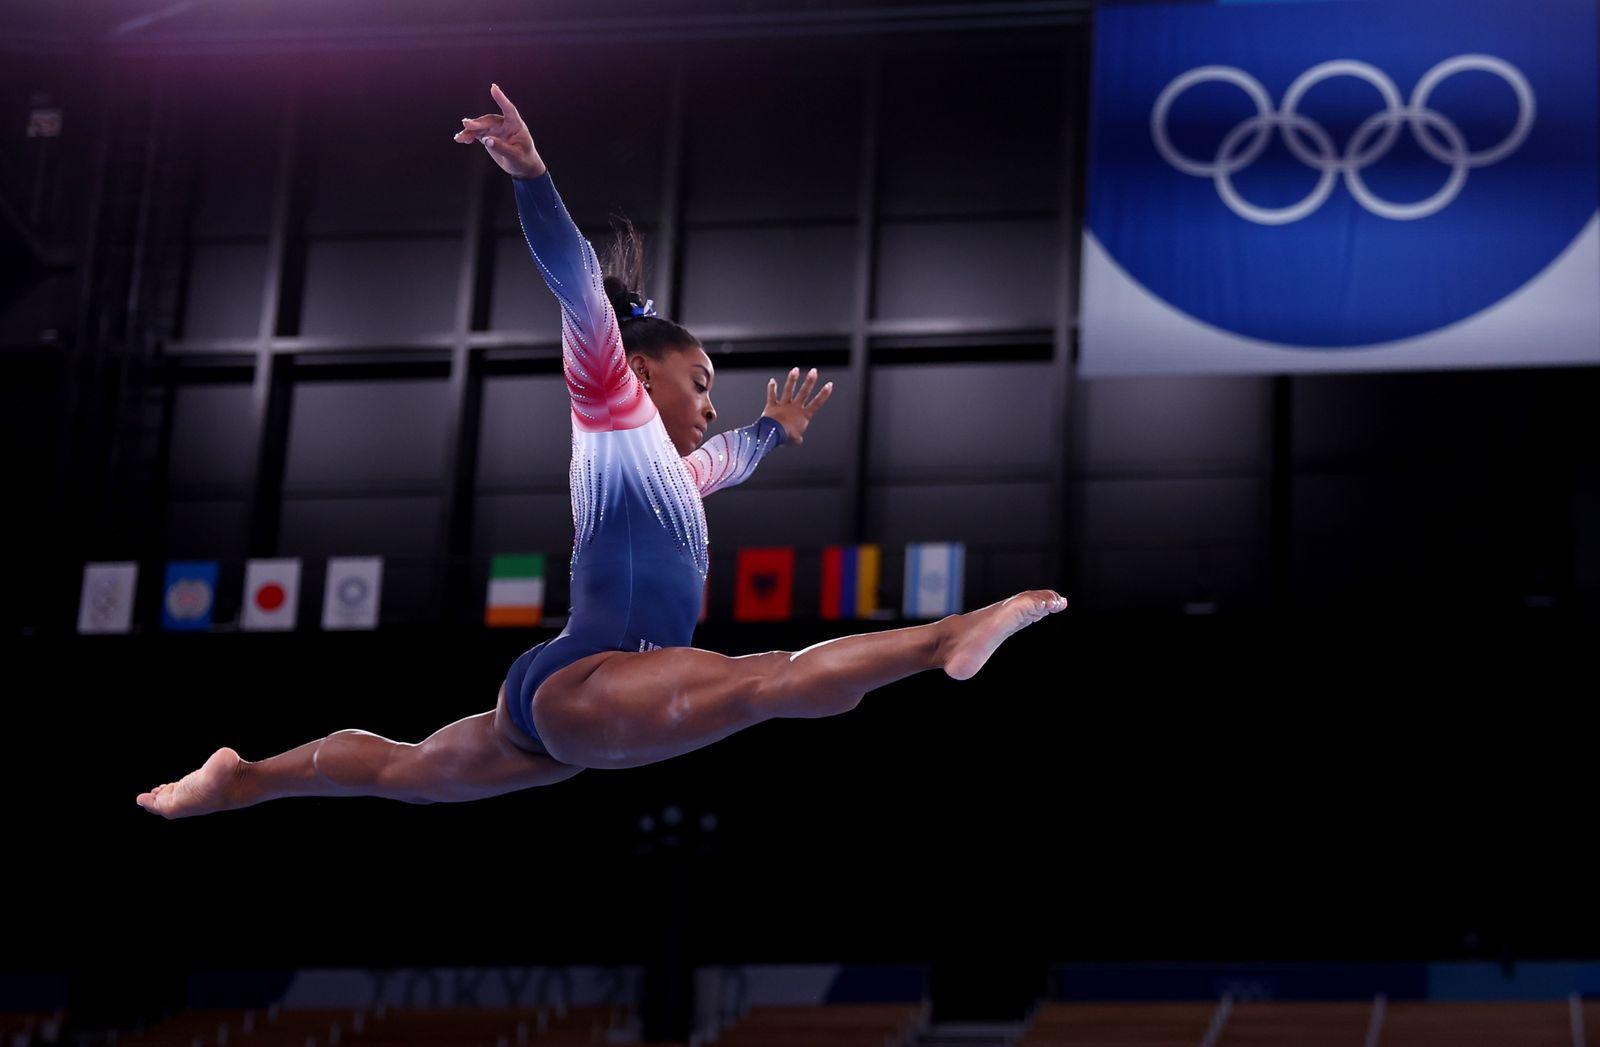 Gymnastics - Artistic - Gymnastics Training